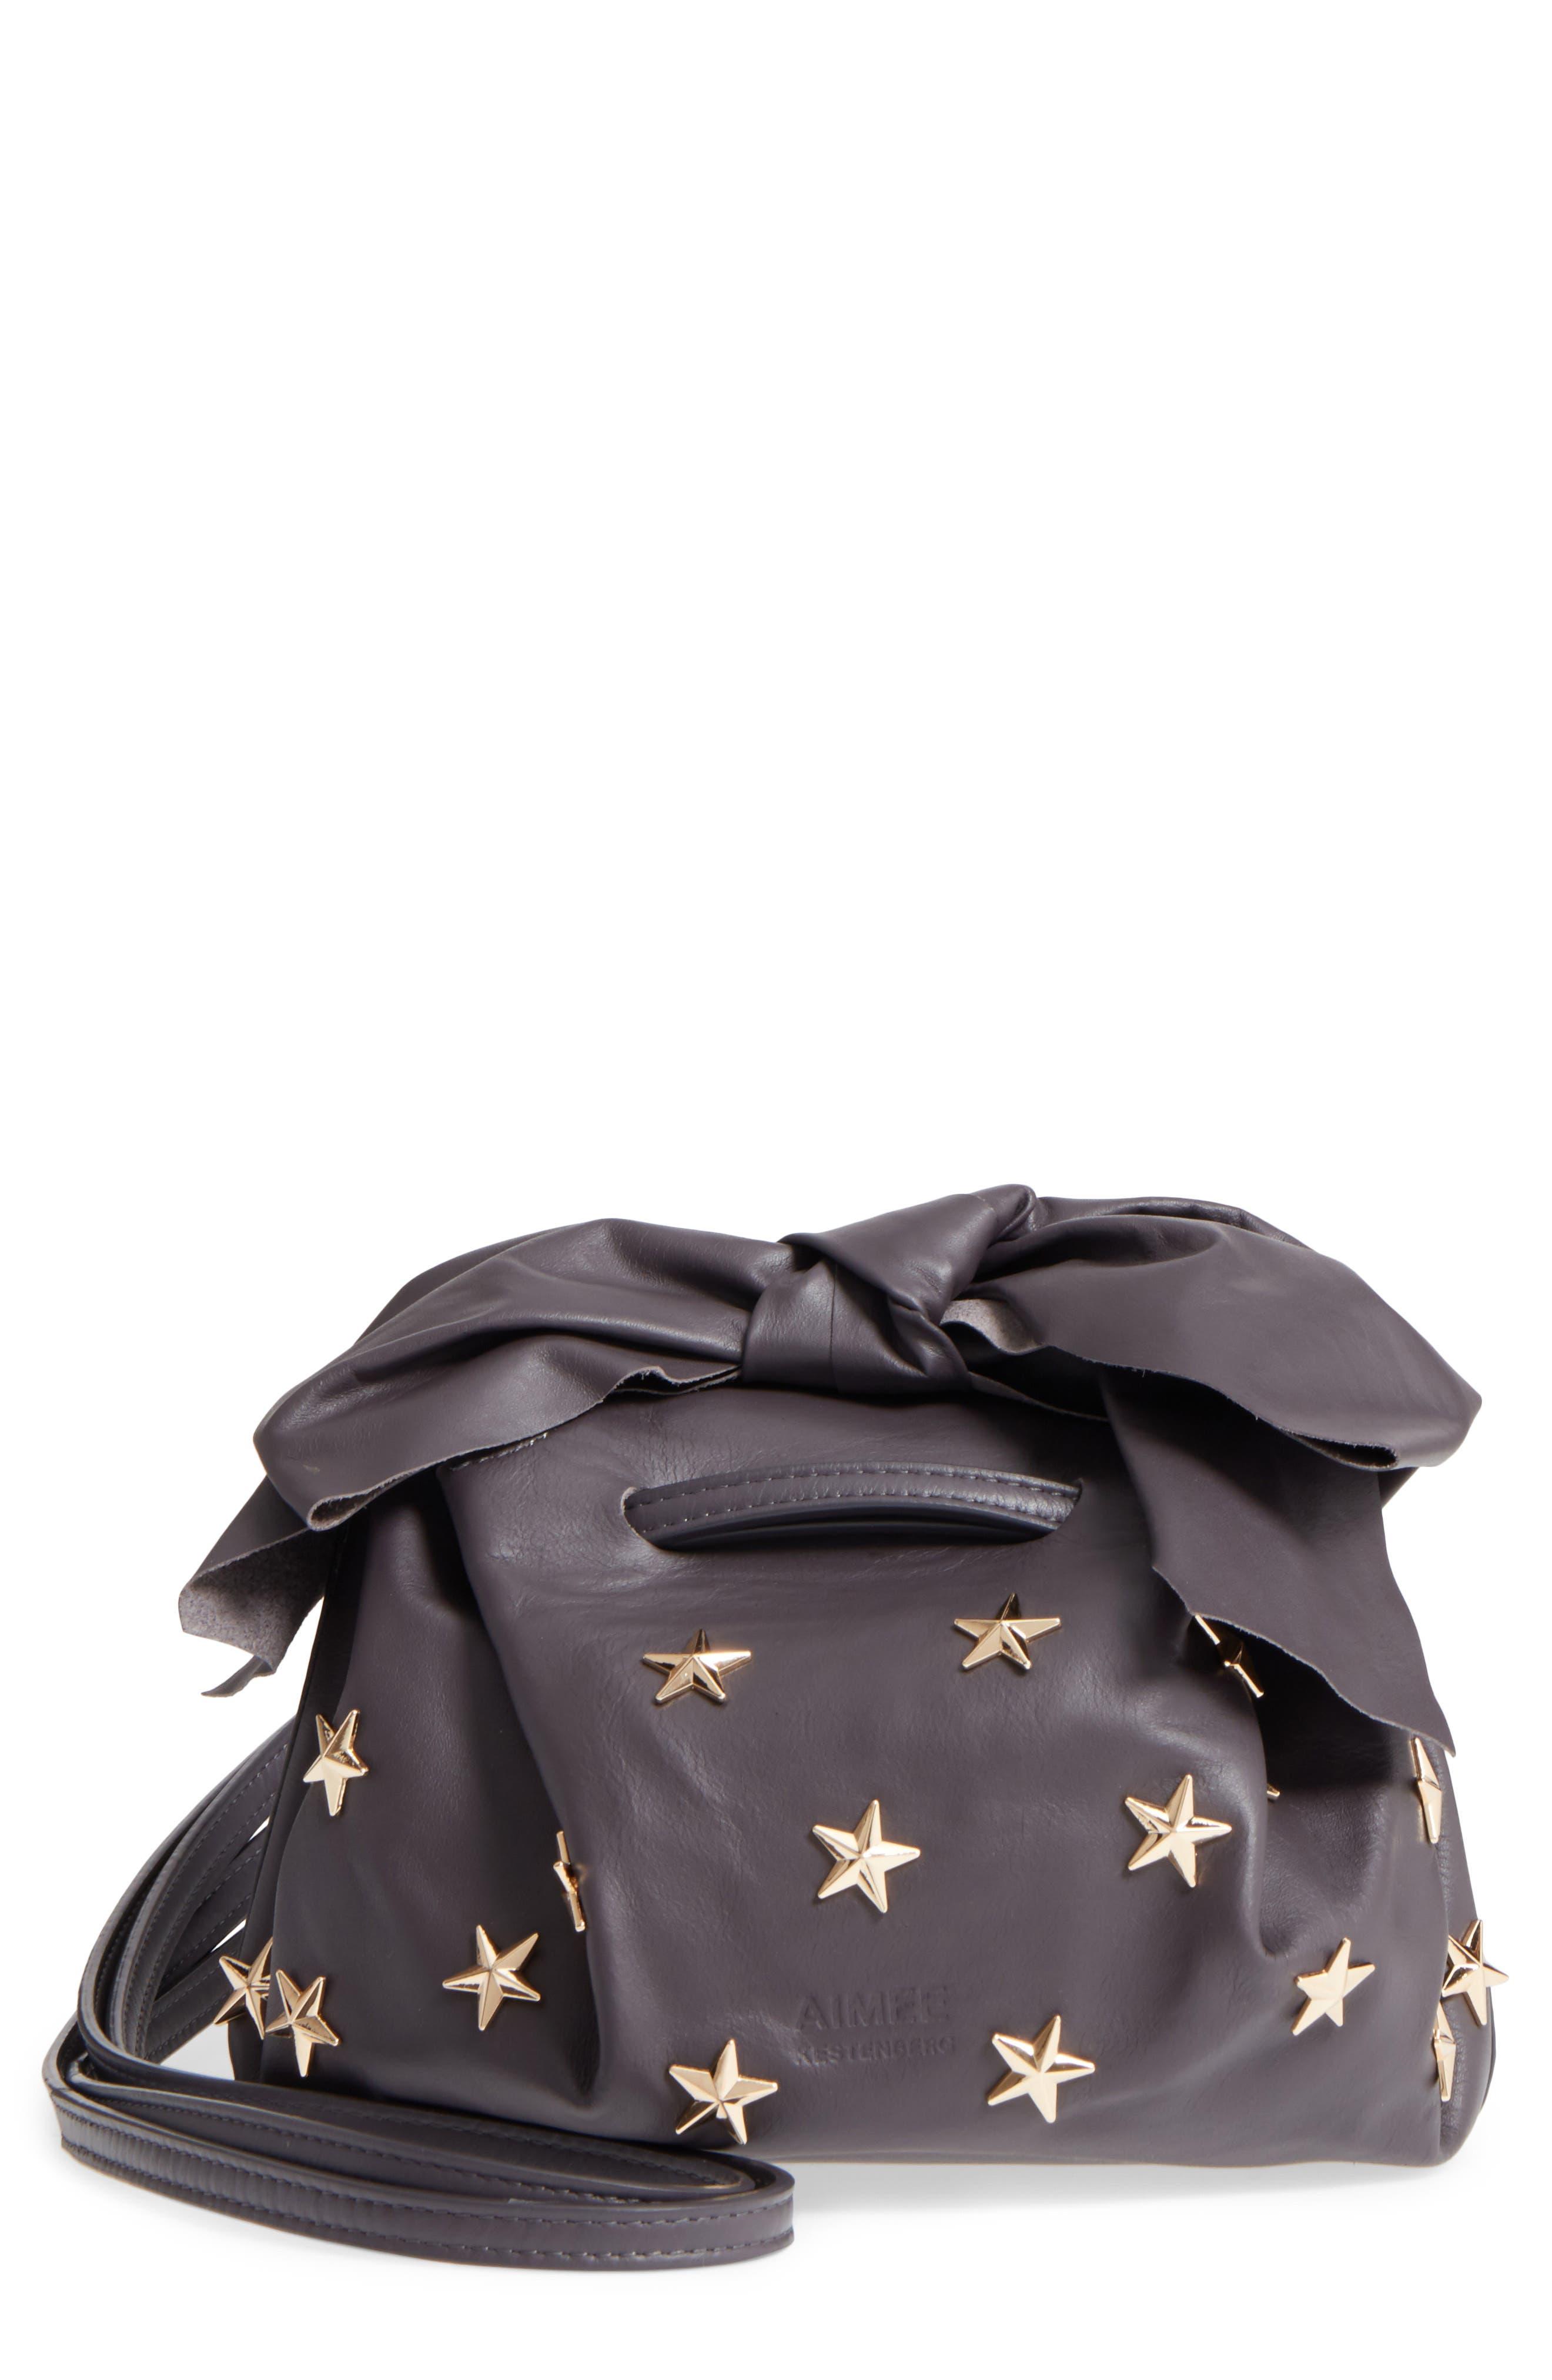 ZAC Zac Posen Soirée Star Stud Leather Crossbody Bag